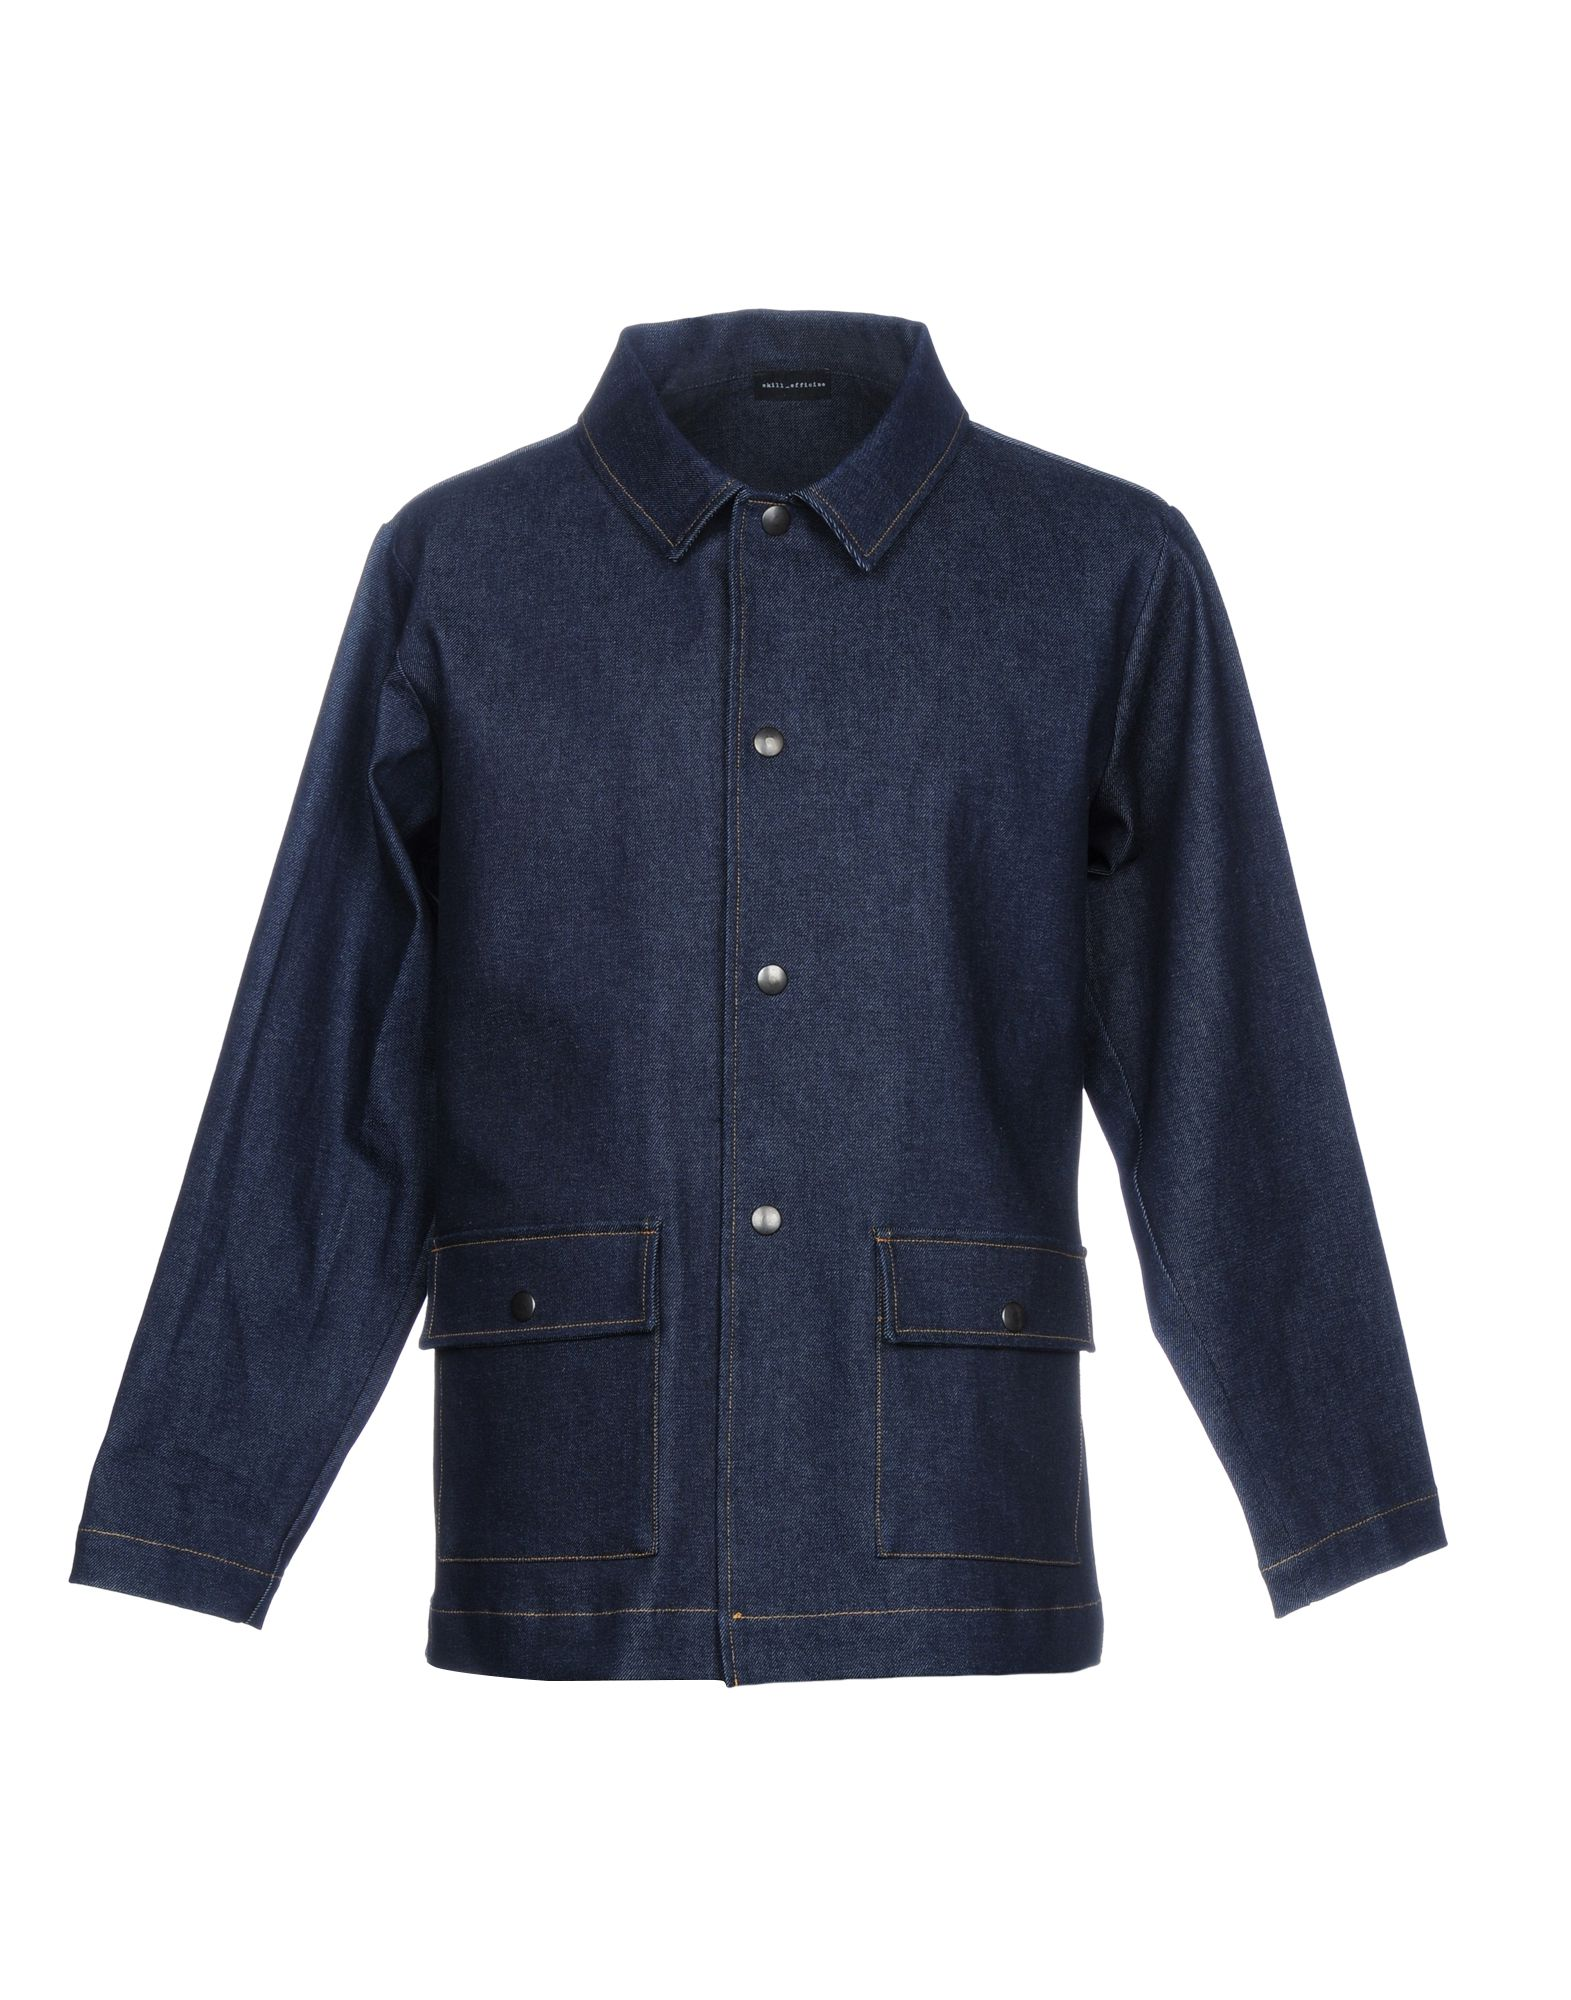 SKILL_OFFICINE Джинсовая верхняя одежда верхняя одежда